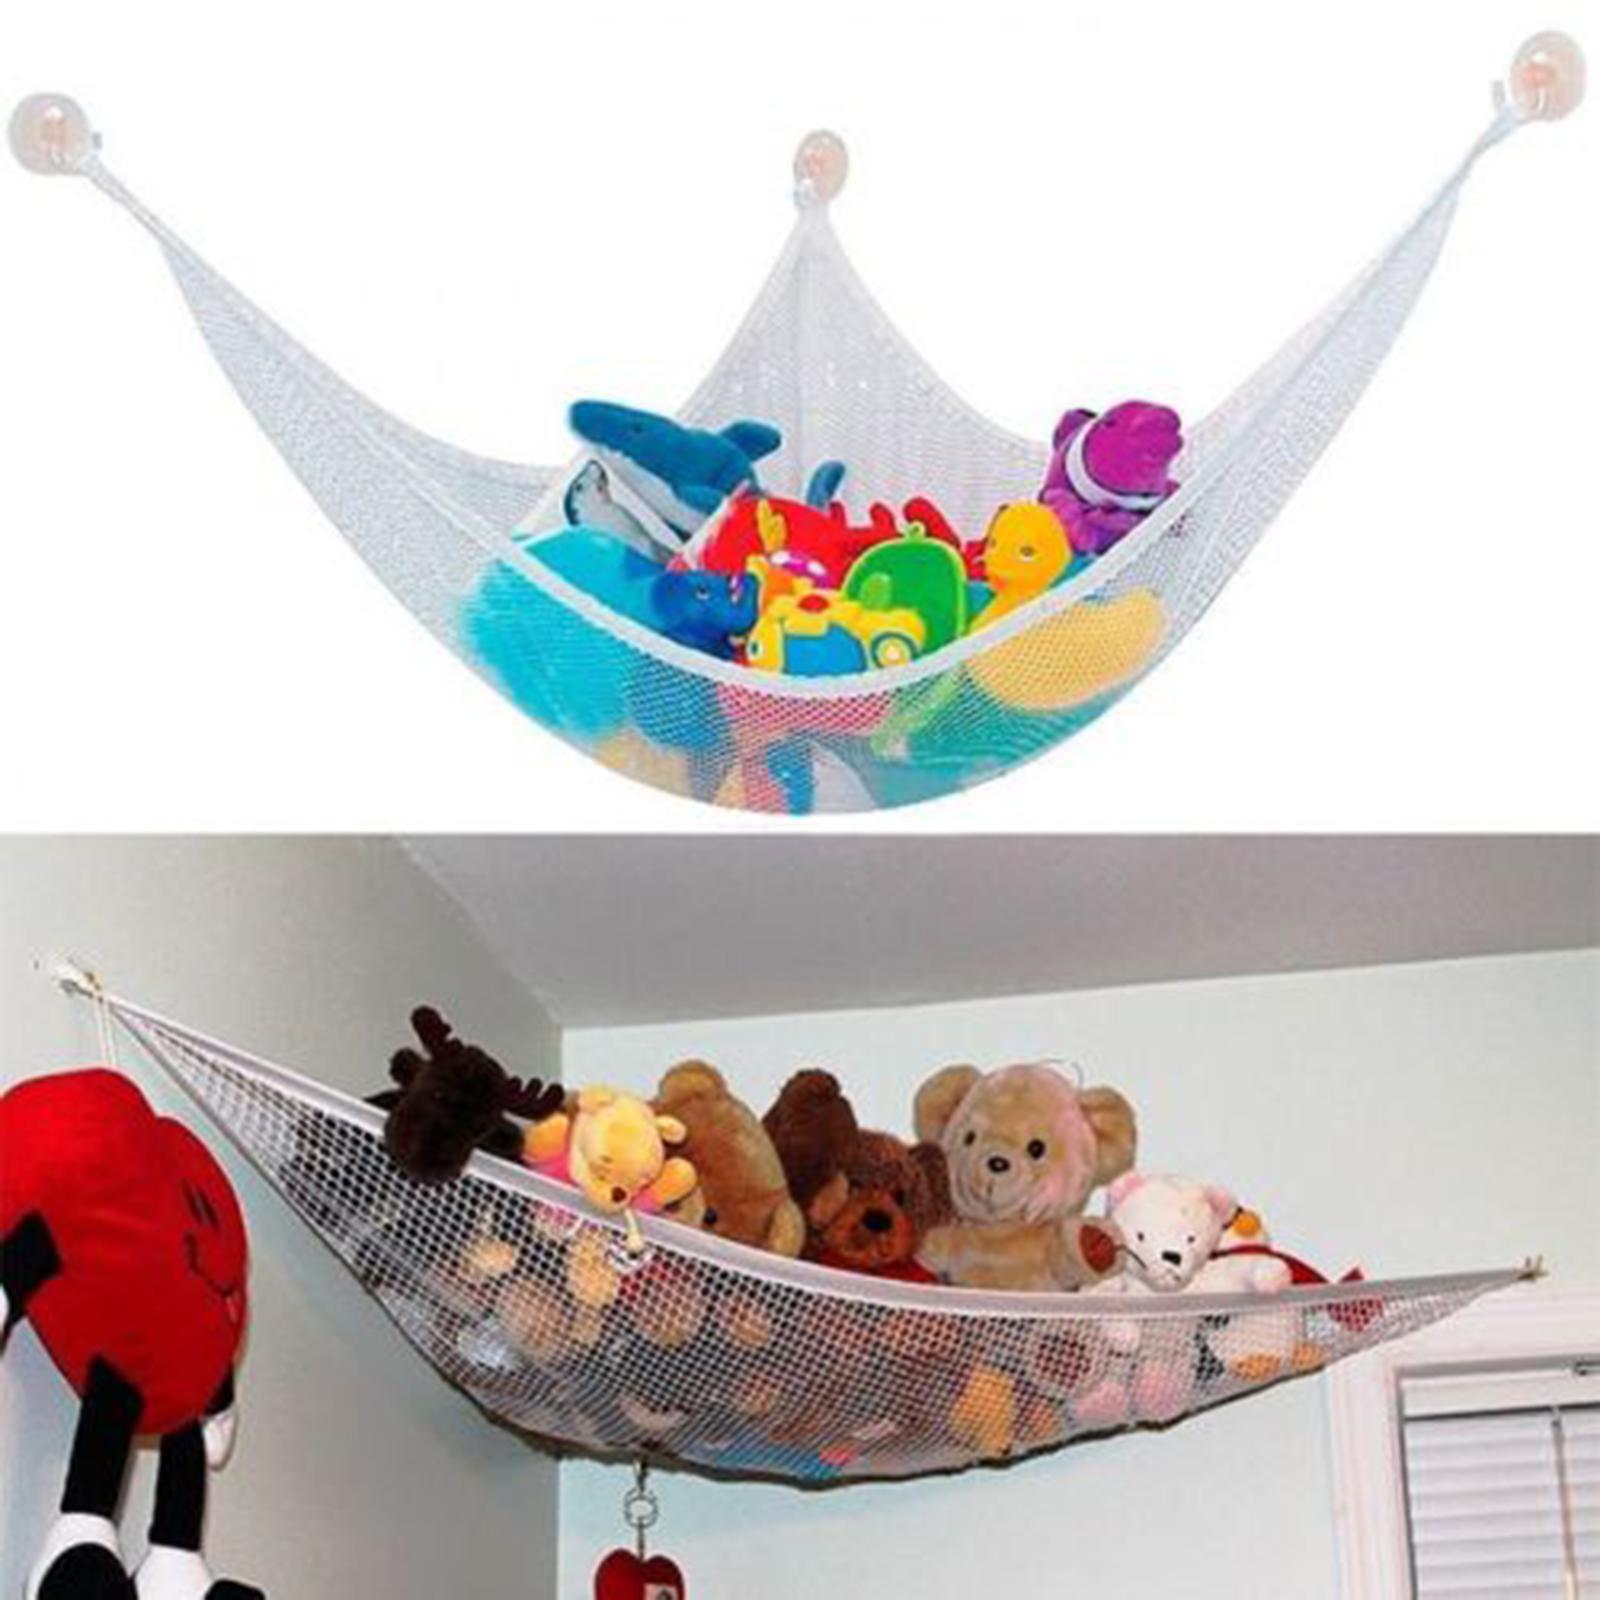 Doll Stuffed Plush Hanging Net Baby Toys Storage Bags Hammock Space Saving US  sc 1 st  eBay & Toy Hammock Net Baby Kids Stuffed Doll Hanging Storage Bags Toys ...